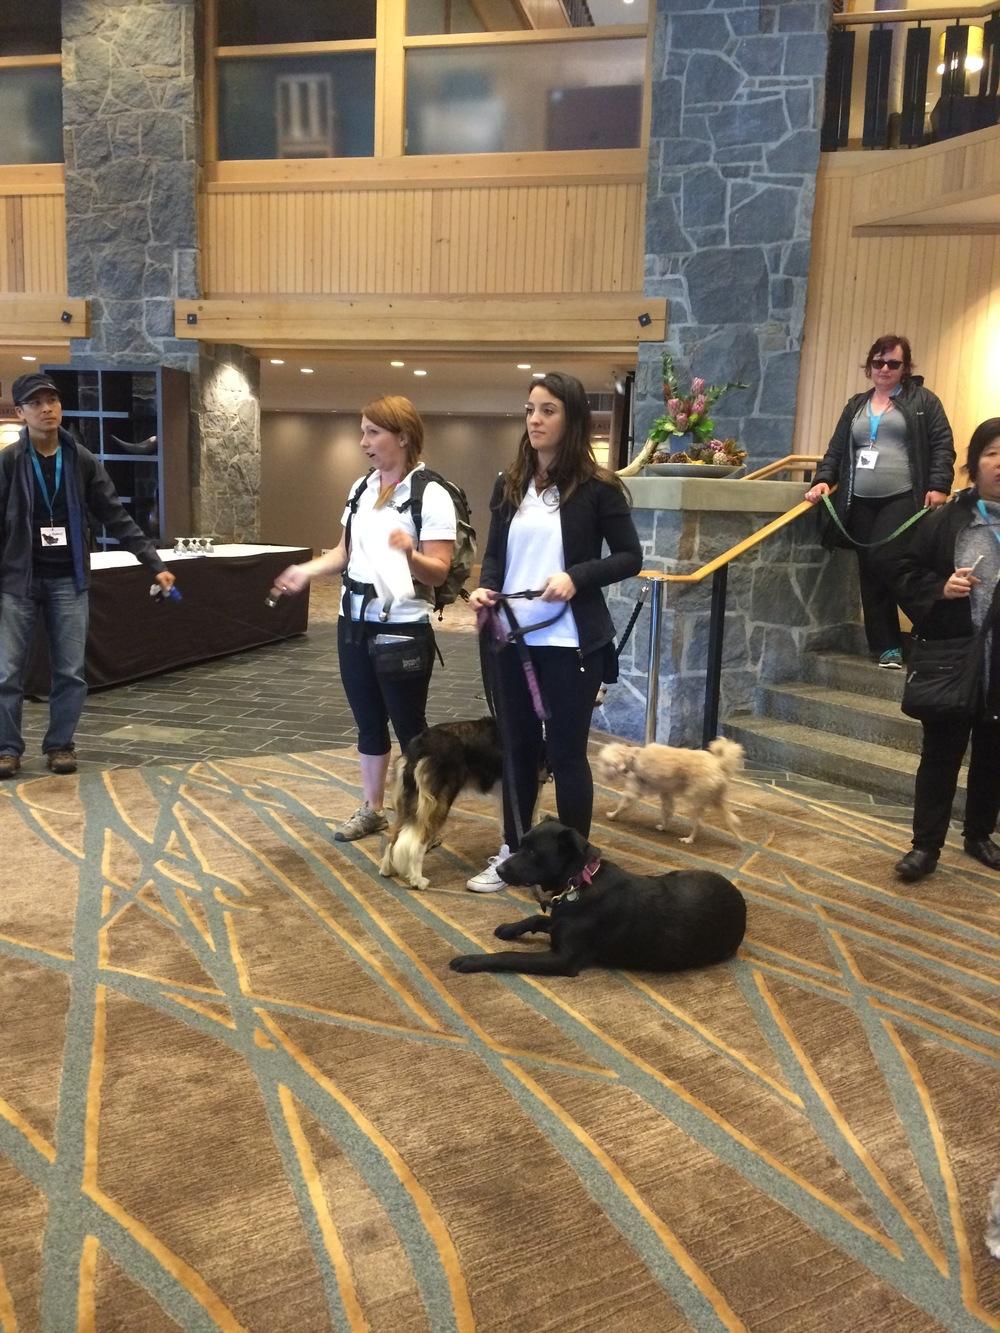 The Alpine Dogs team